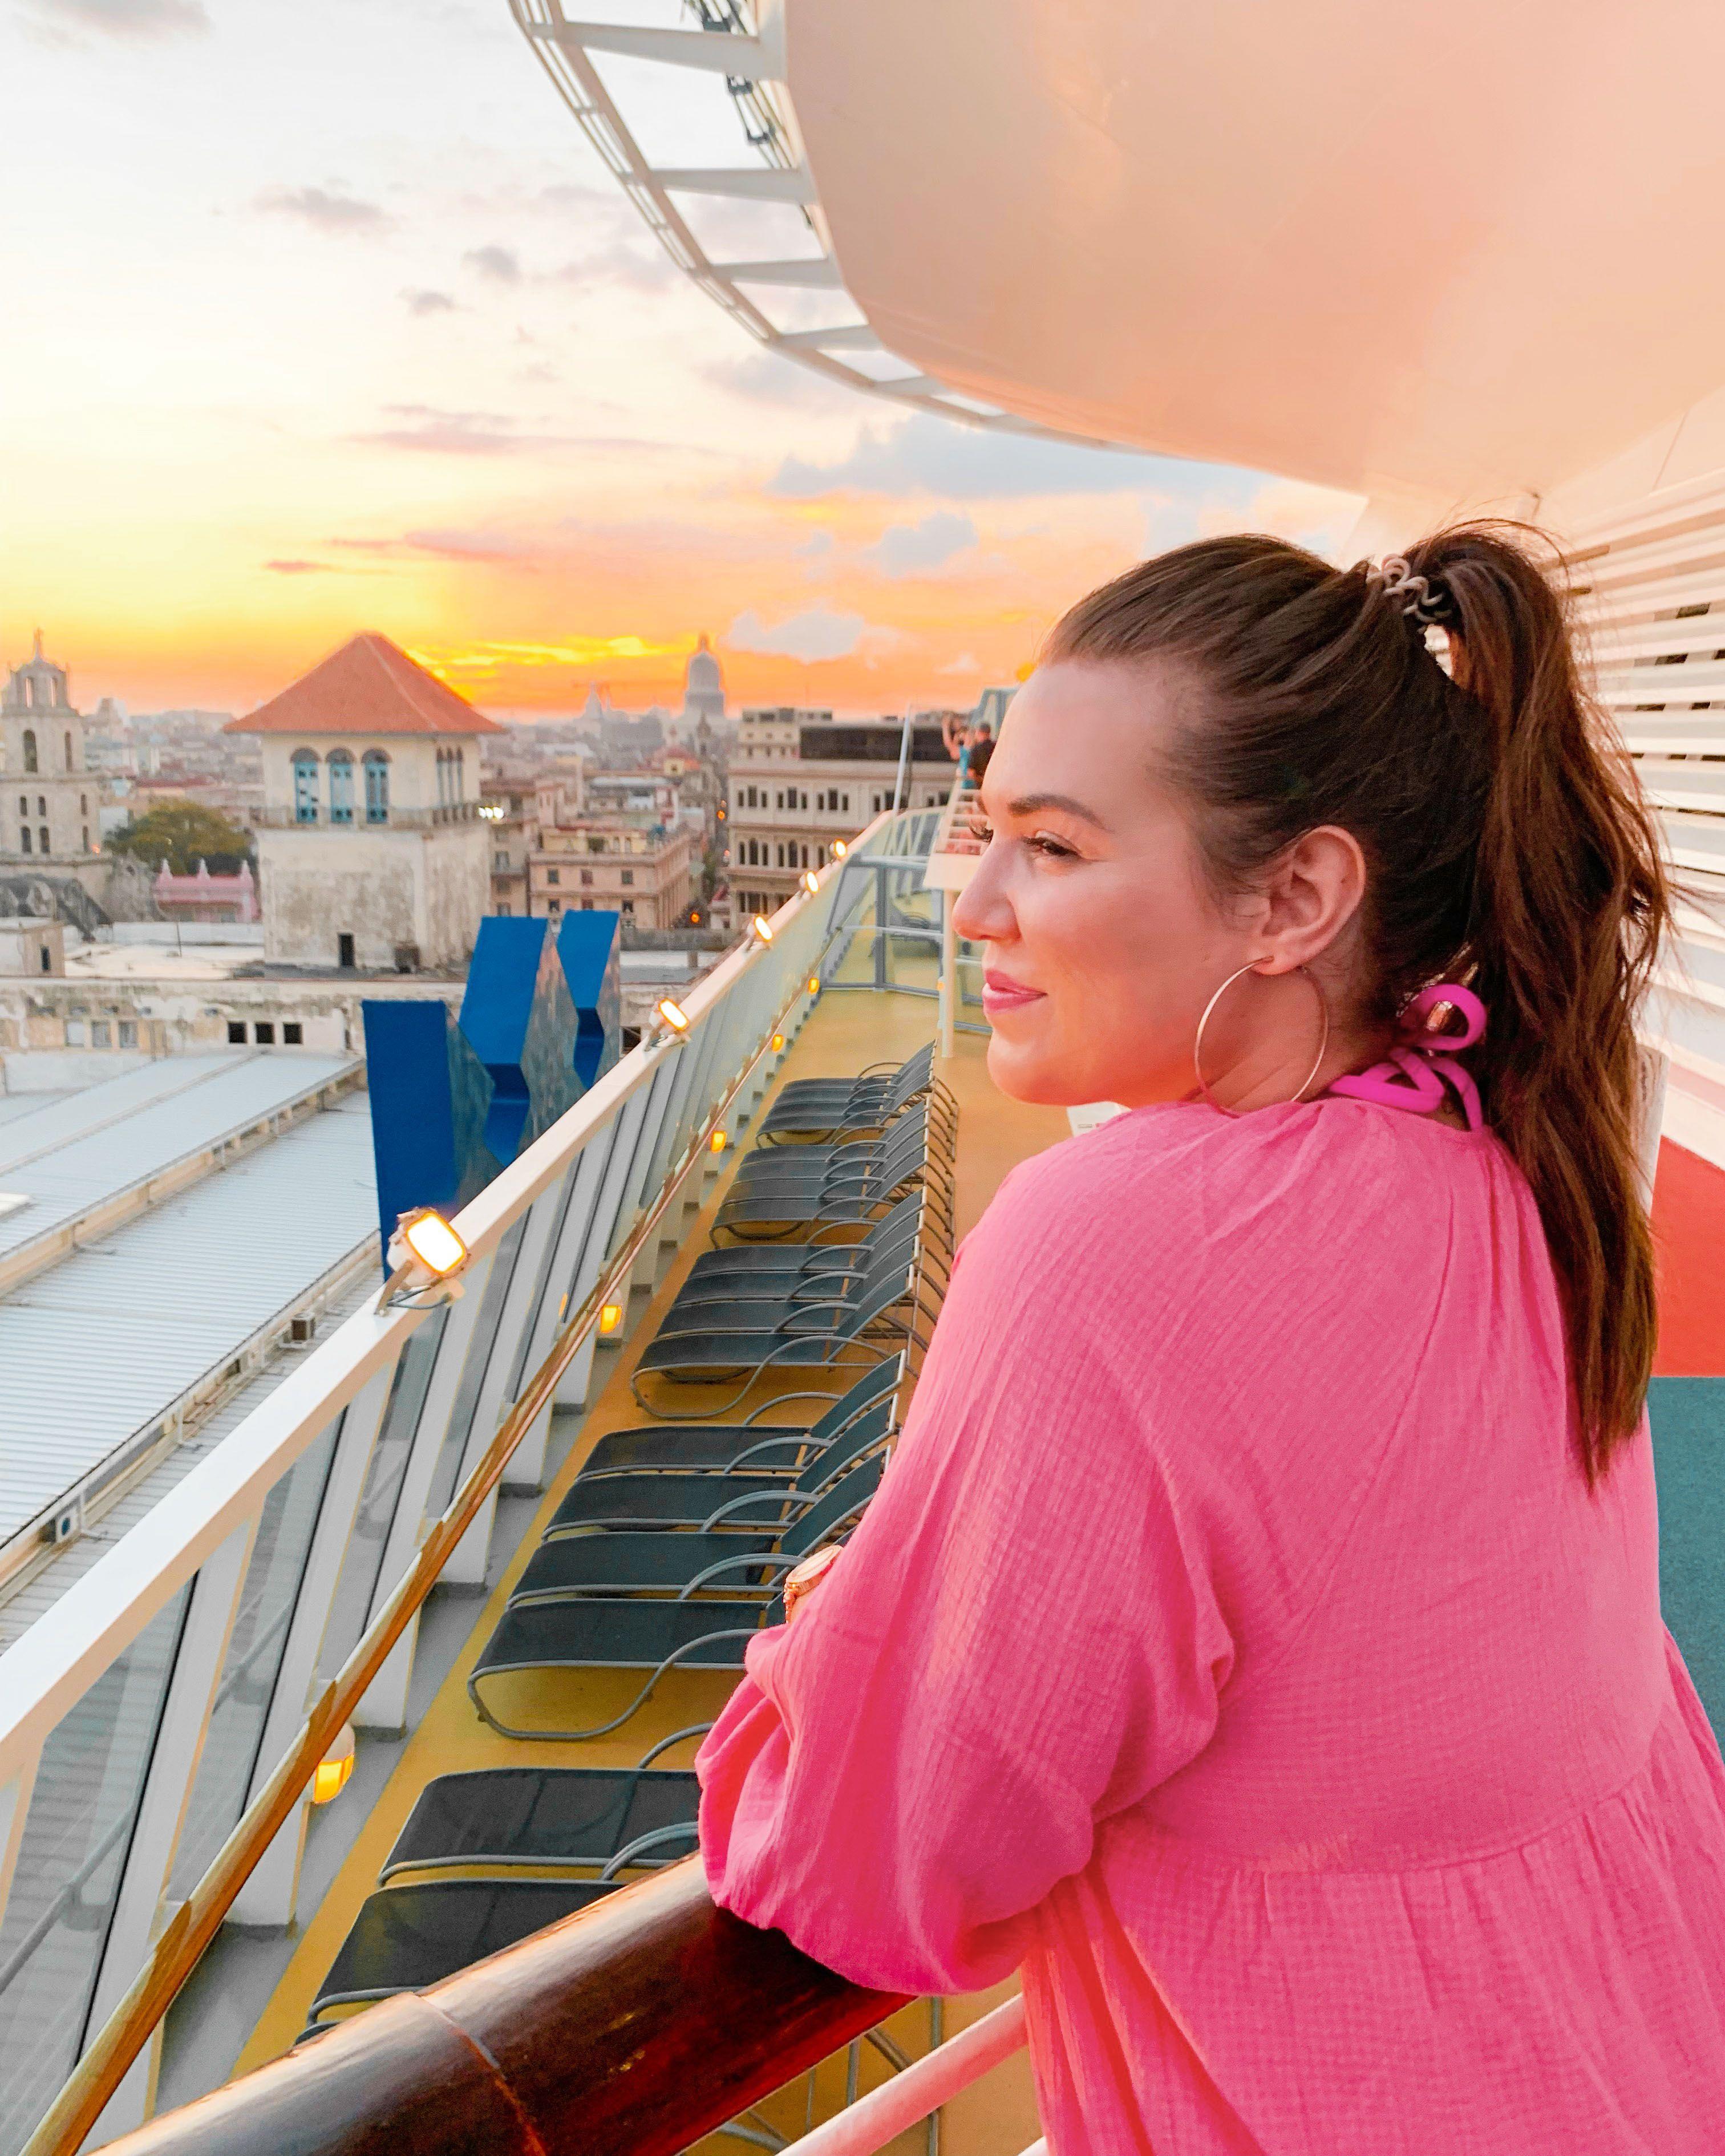 Caribbean Cruise Key West Cuba Caribbean Cruise Sassy Red Lipstick Caribbean